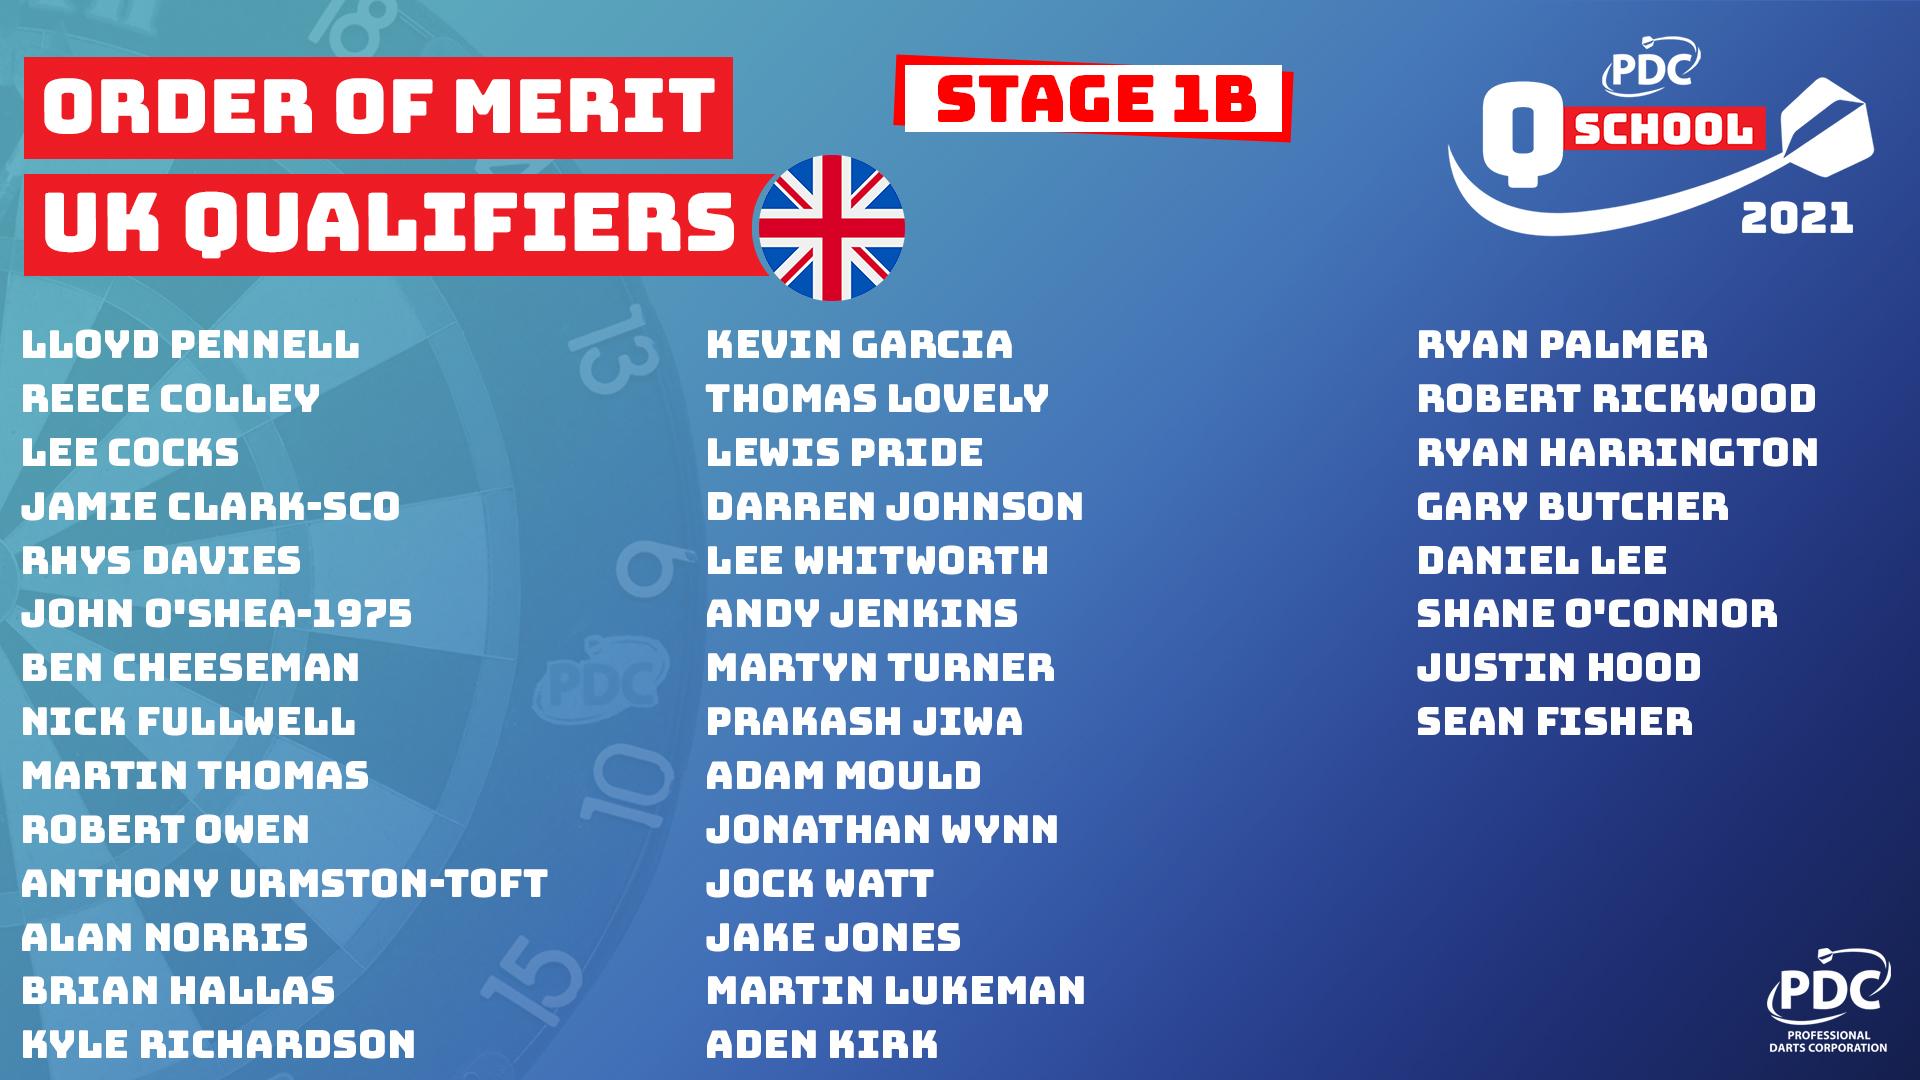 UK Stage 1B Order of Merit Qualifiers